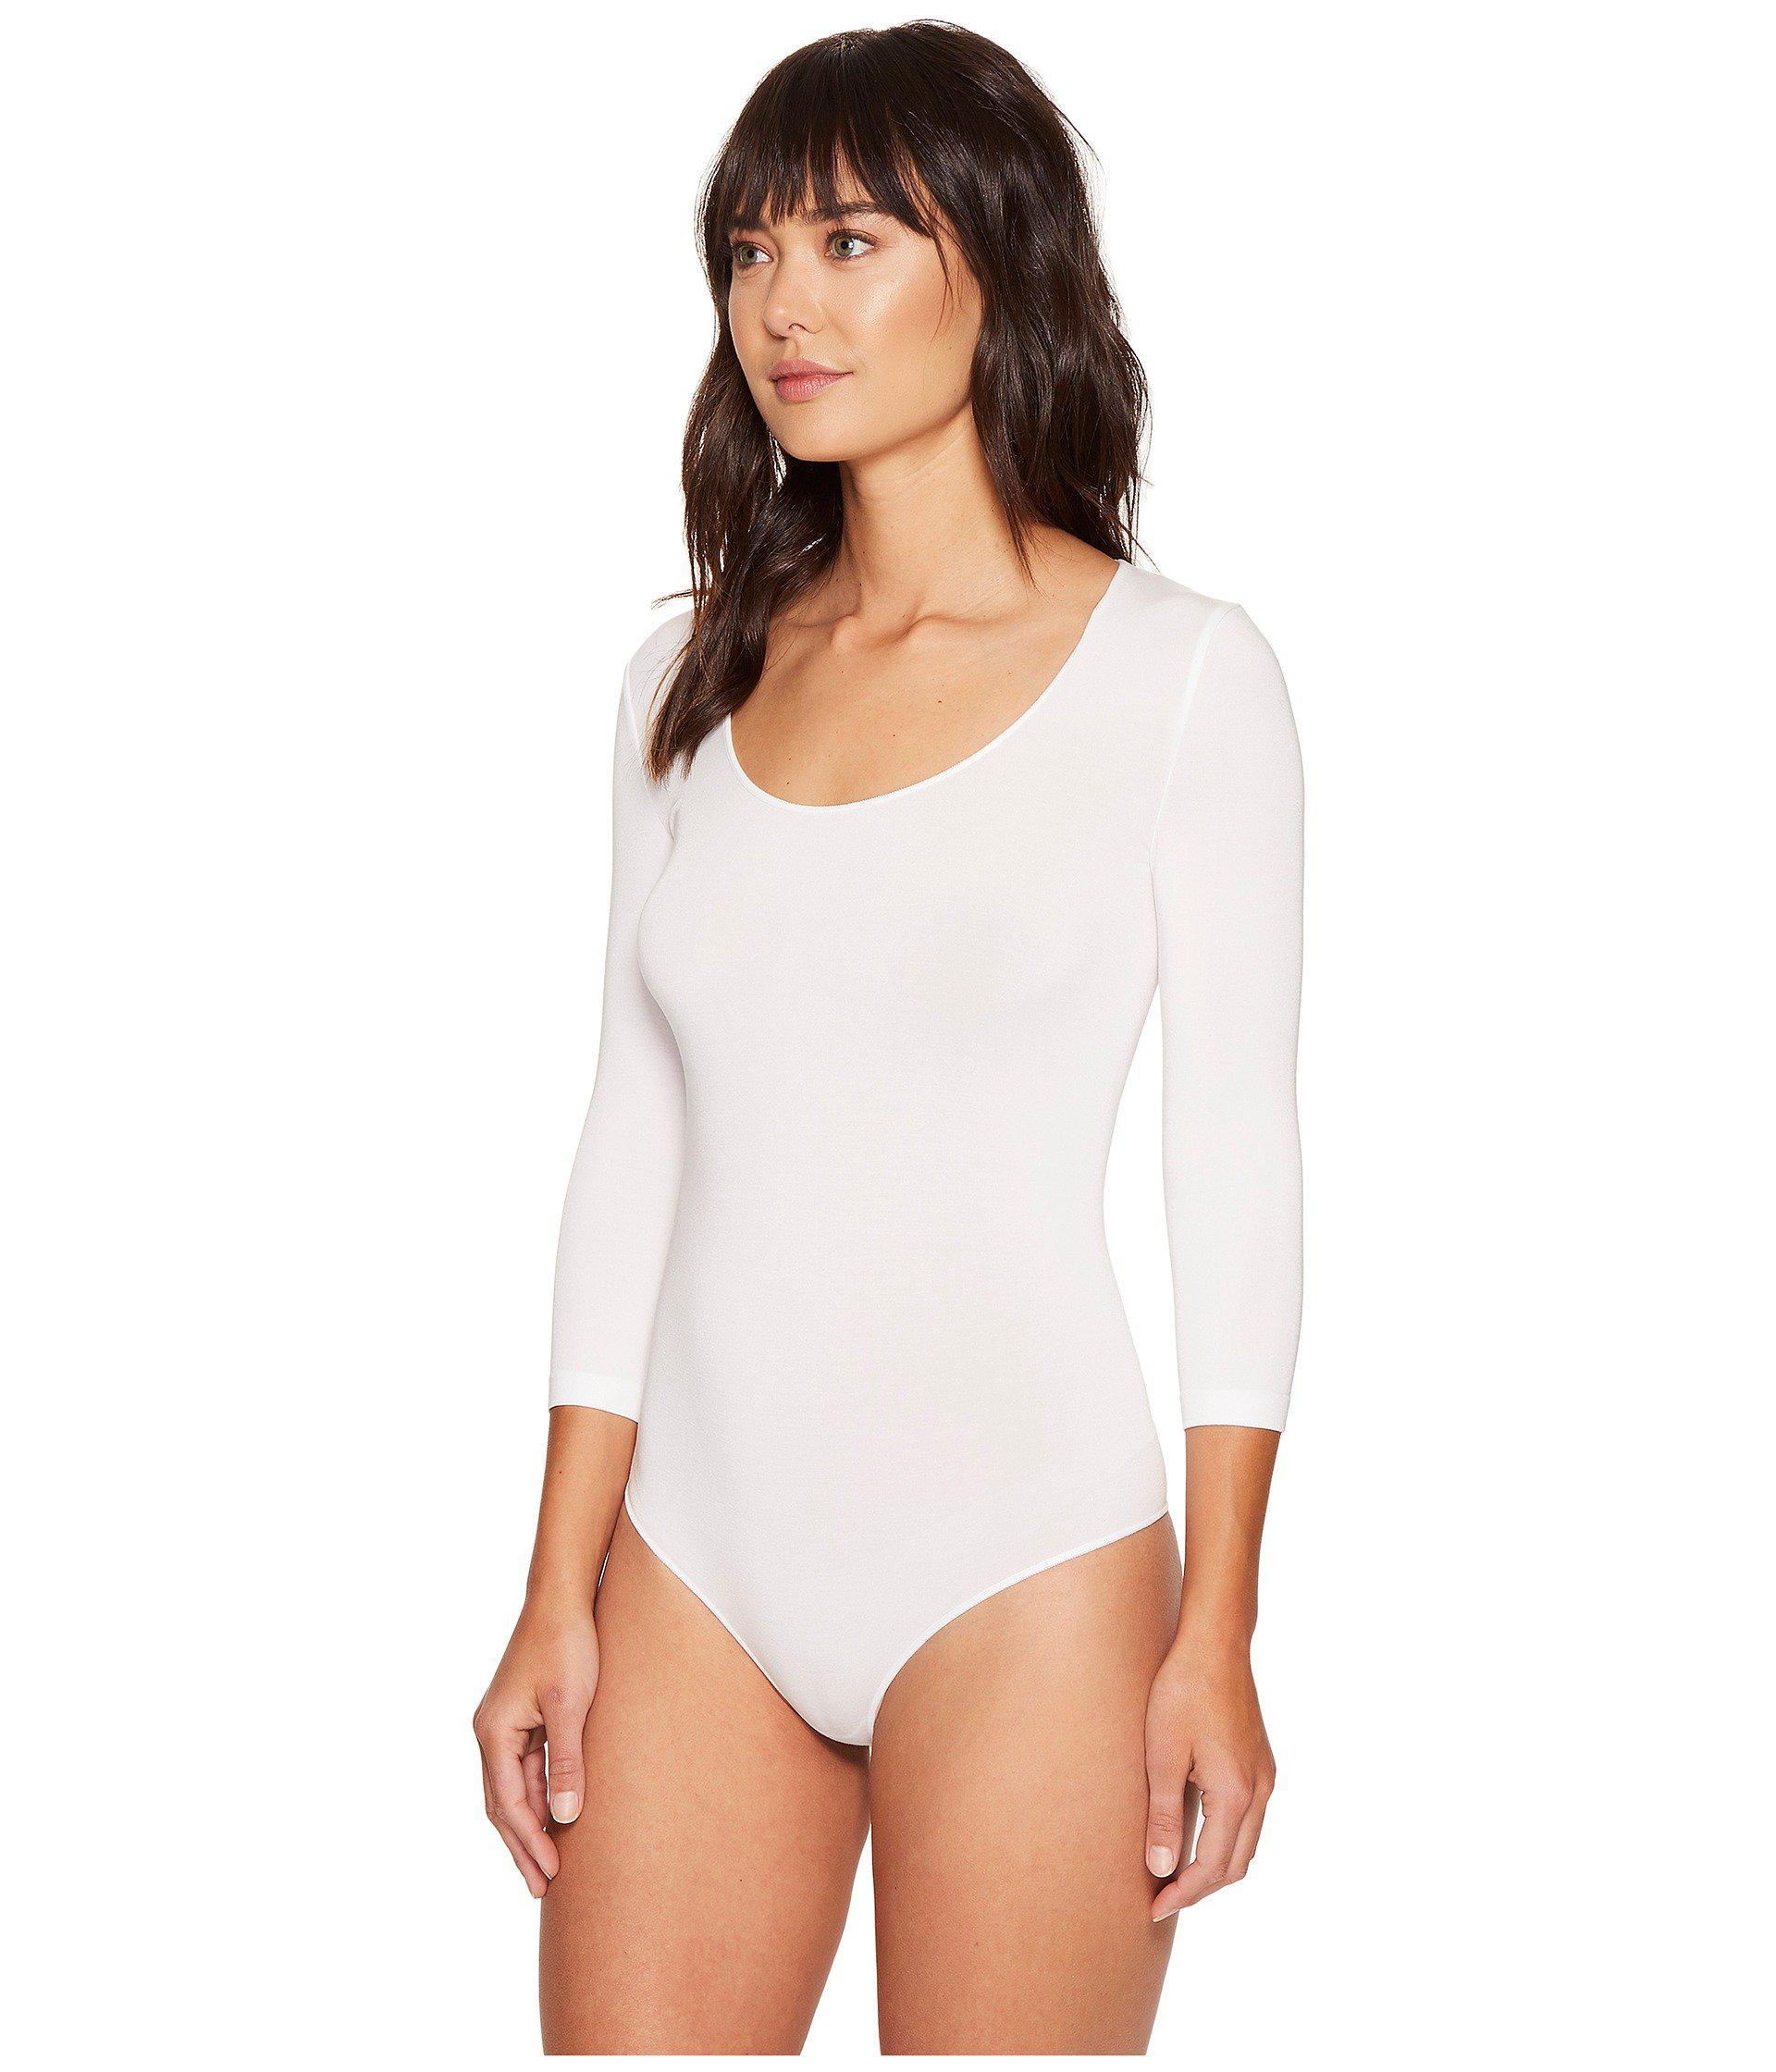 376f0a8e8e Lyst - Wolford Tokio String Bodysuit (black) Women s Underwear in White